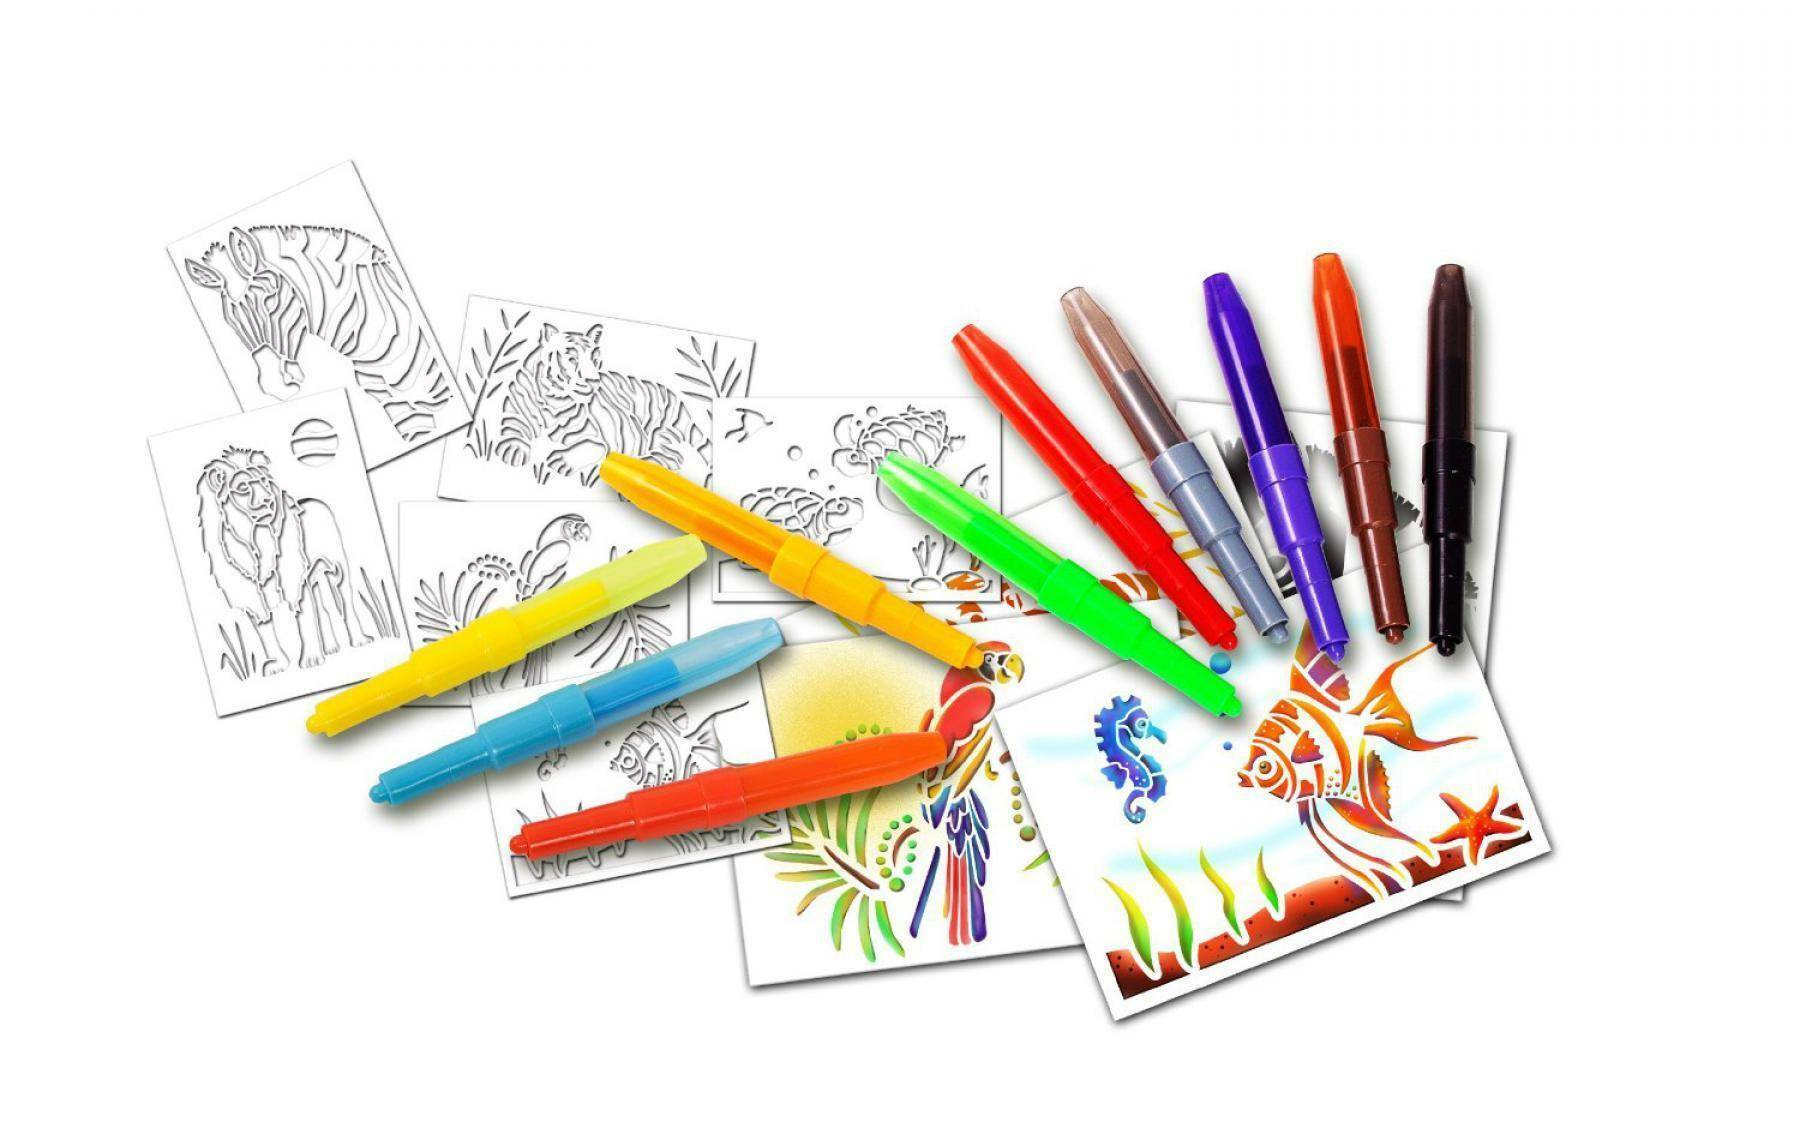 auguri preziosi auguri preziosi blopens activity kit 10 penne e 6 stencil animali